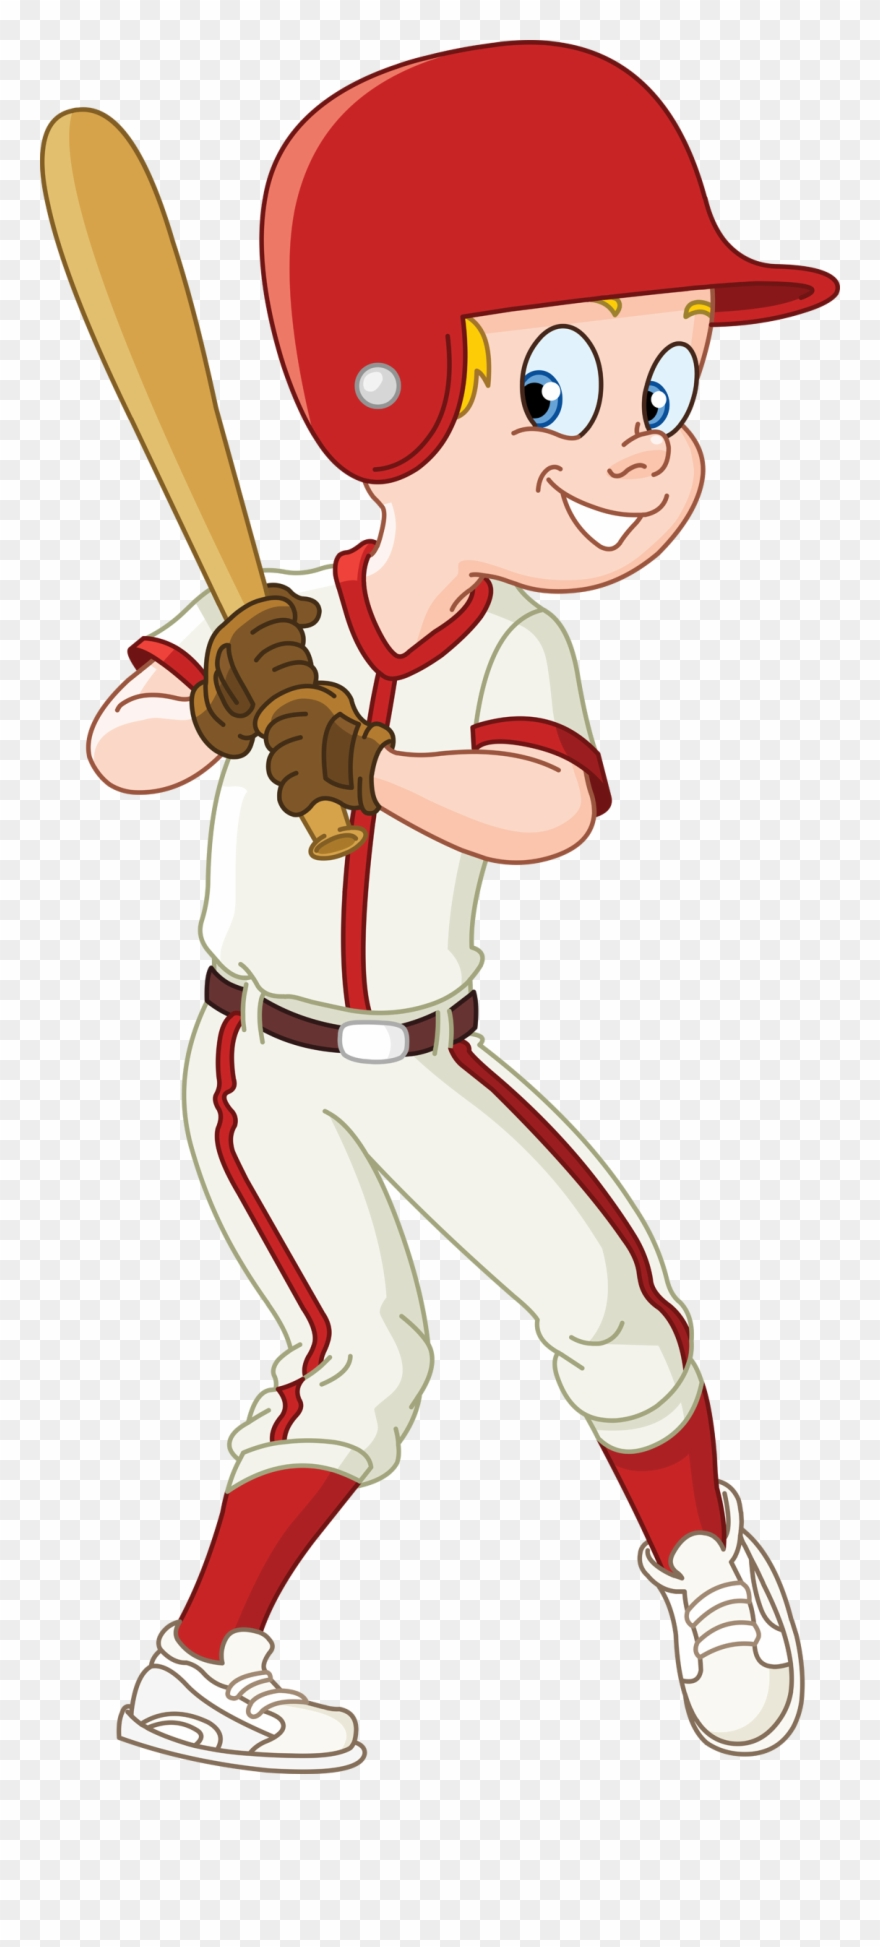 Baseball cartoon cliparts vector free download Sports Grant Beach Neighborhood - Baseball Player Cartoon Png ... vector free download